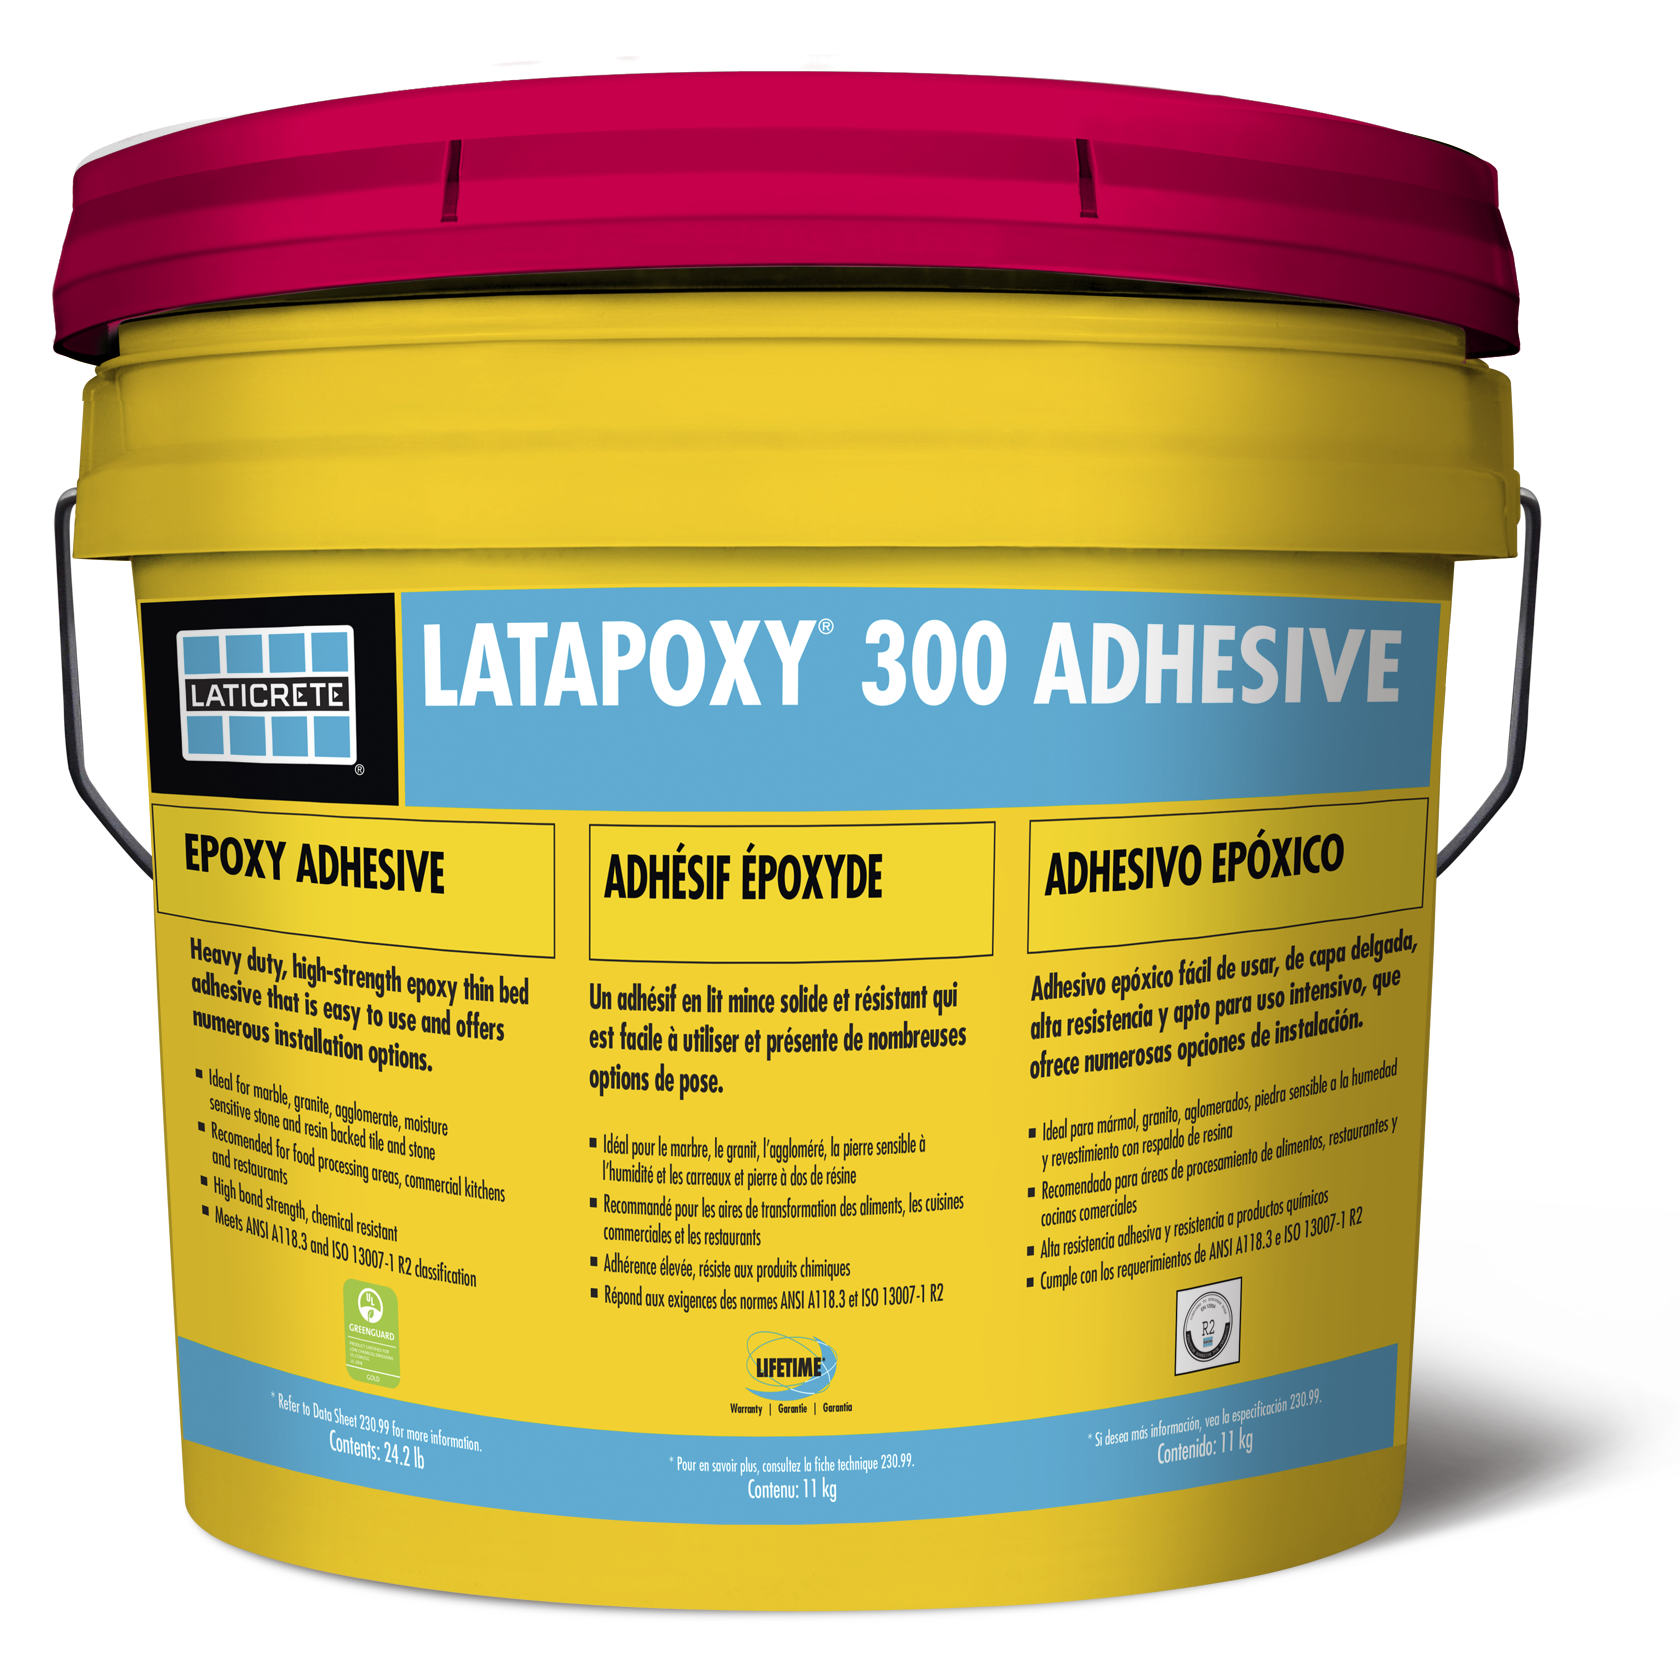 LATAPOXY® 300 Adhesive